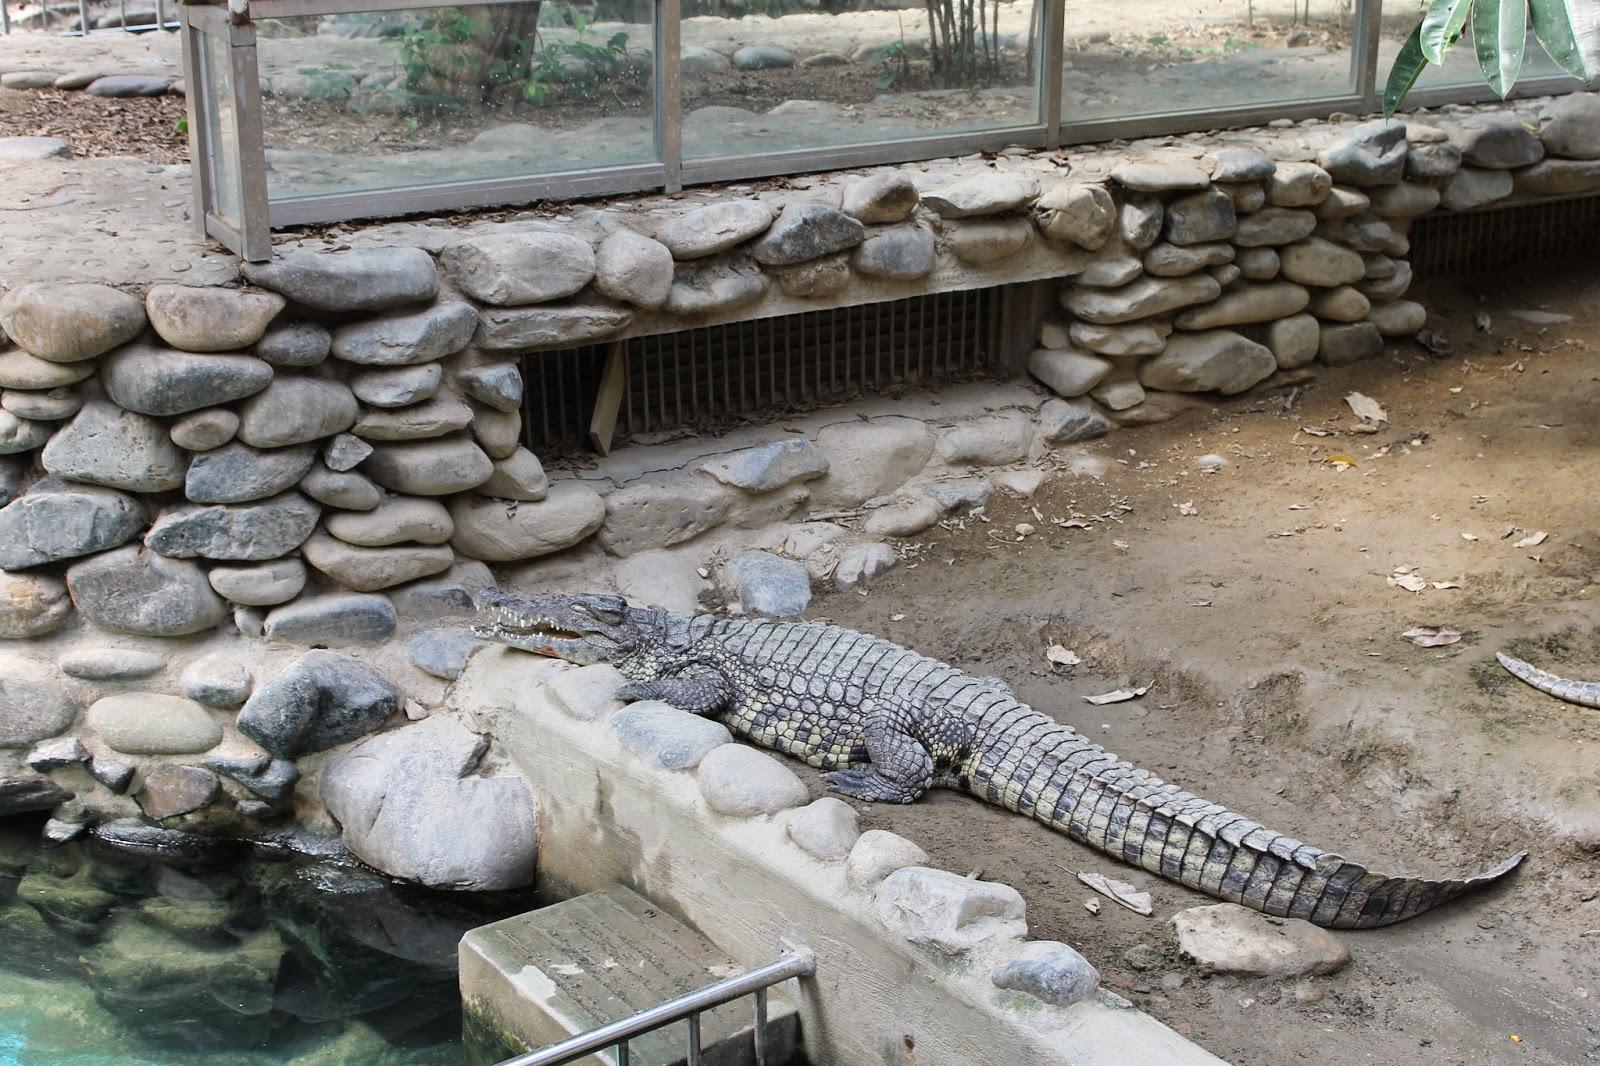 Seoul Zoo, Seoul, зоопарк в сеуле, сеул, корея, зоопарк, крокодил